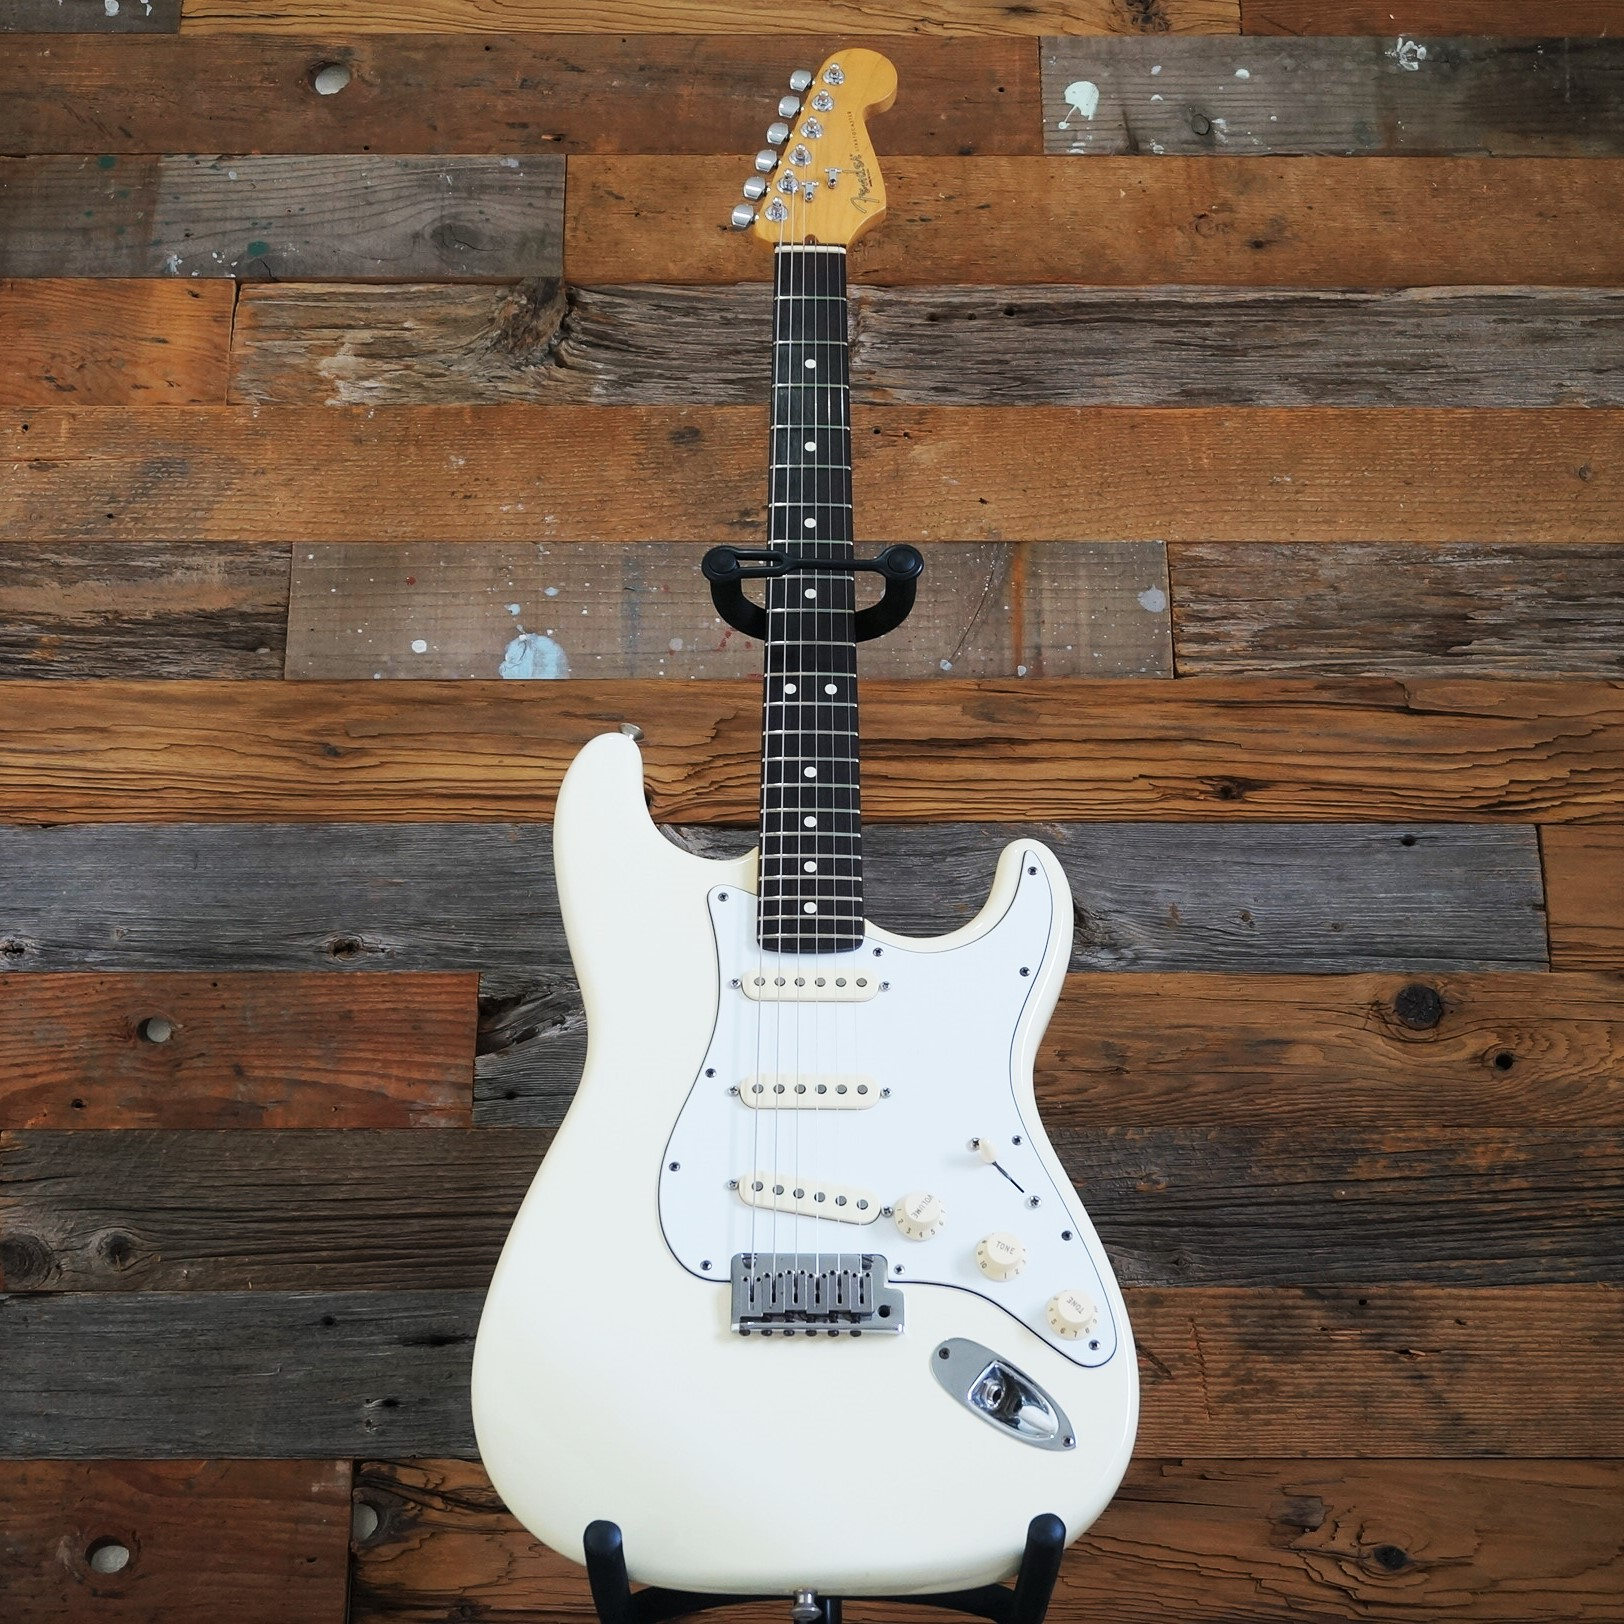 Fender USA American Standard Stratocaster #N9399645